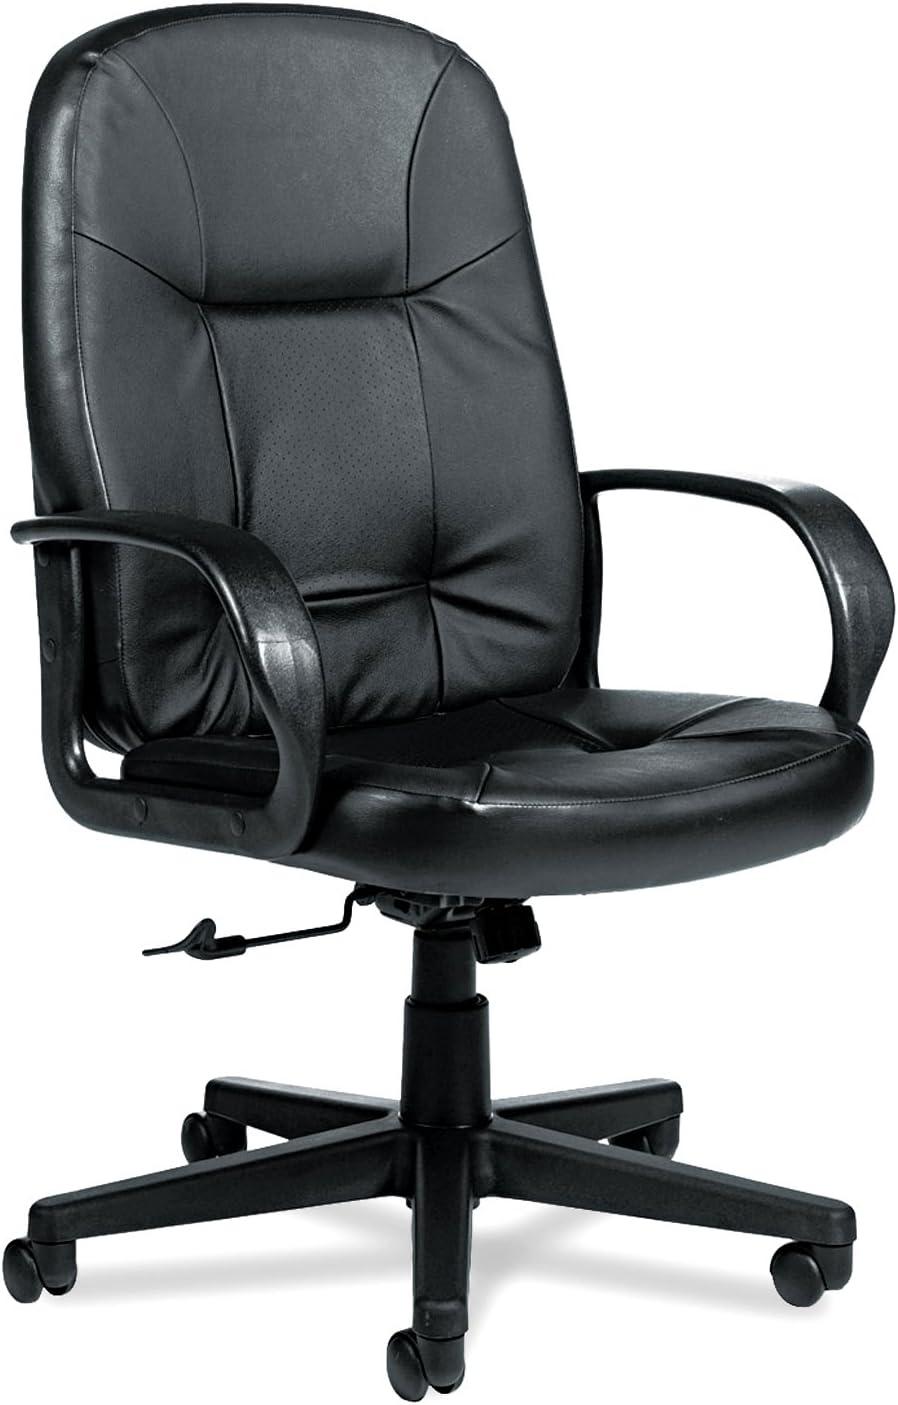 Global Arno Executive Leather High-Back Swivel/Tilt Chair